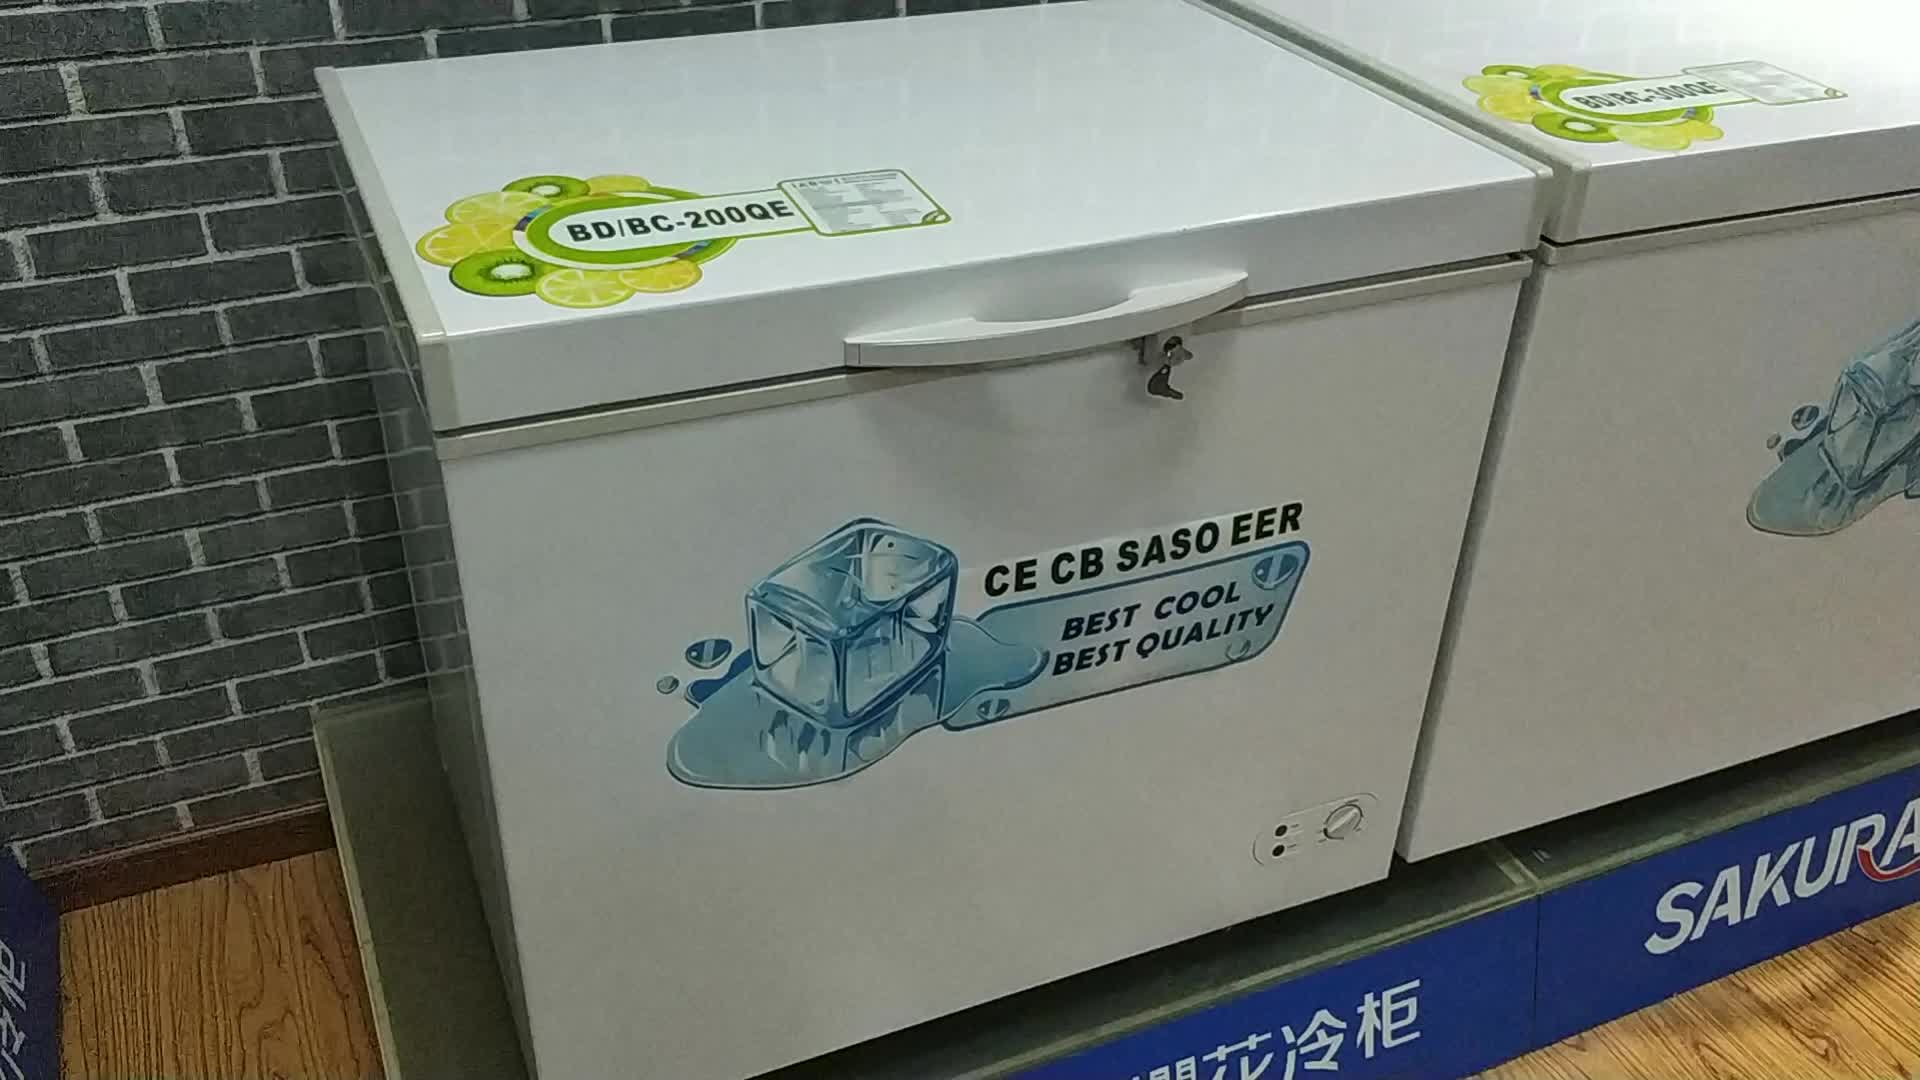 BERING BD/BC-200DC 12V CHEST FREEZER SOLAR Freezer